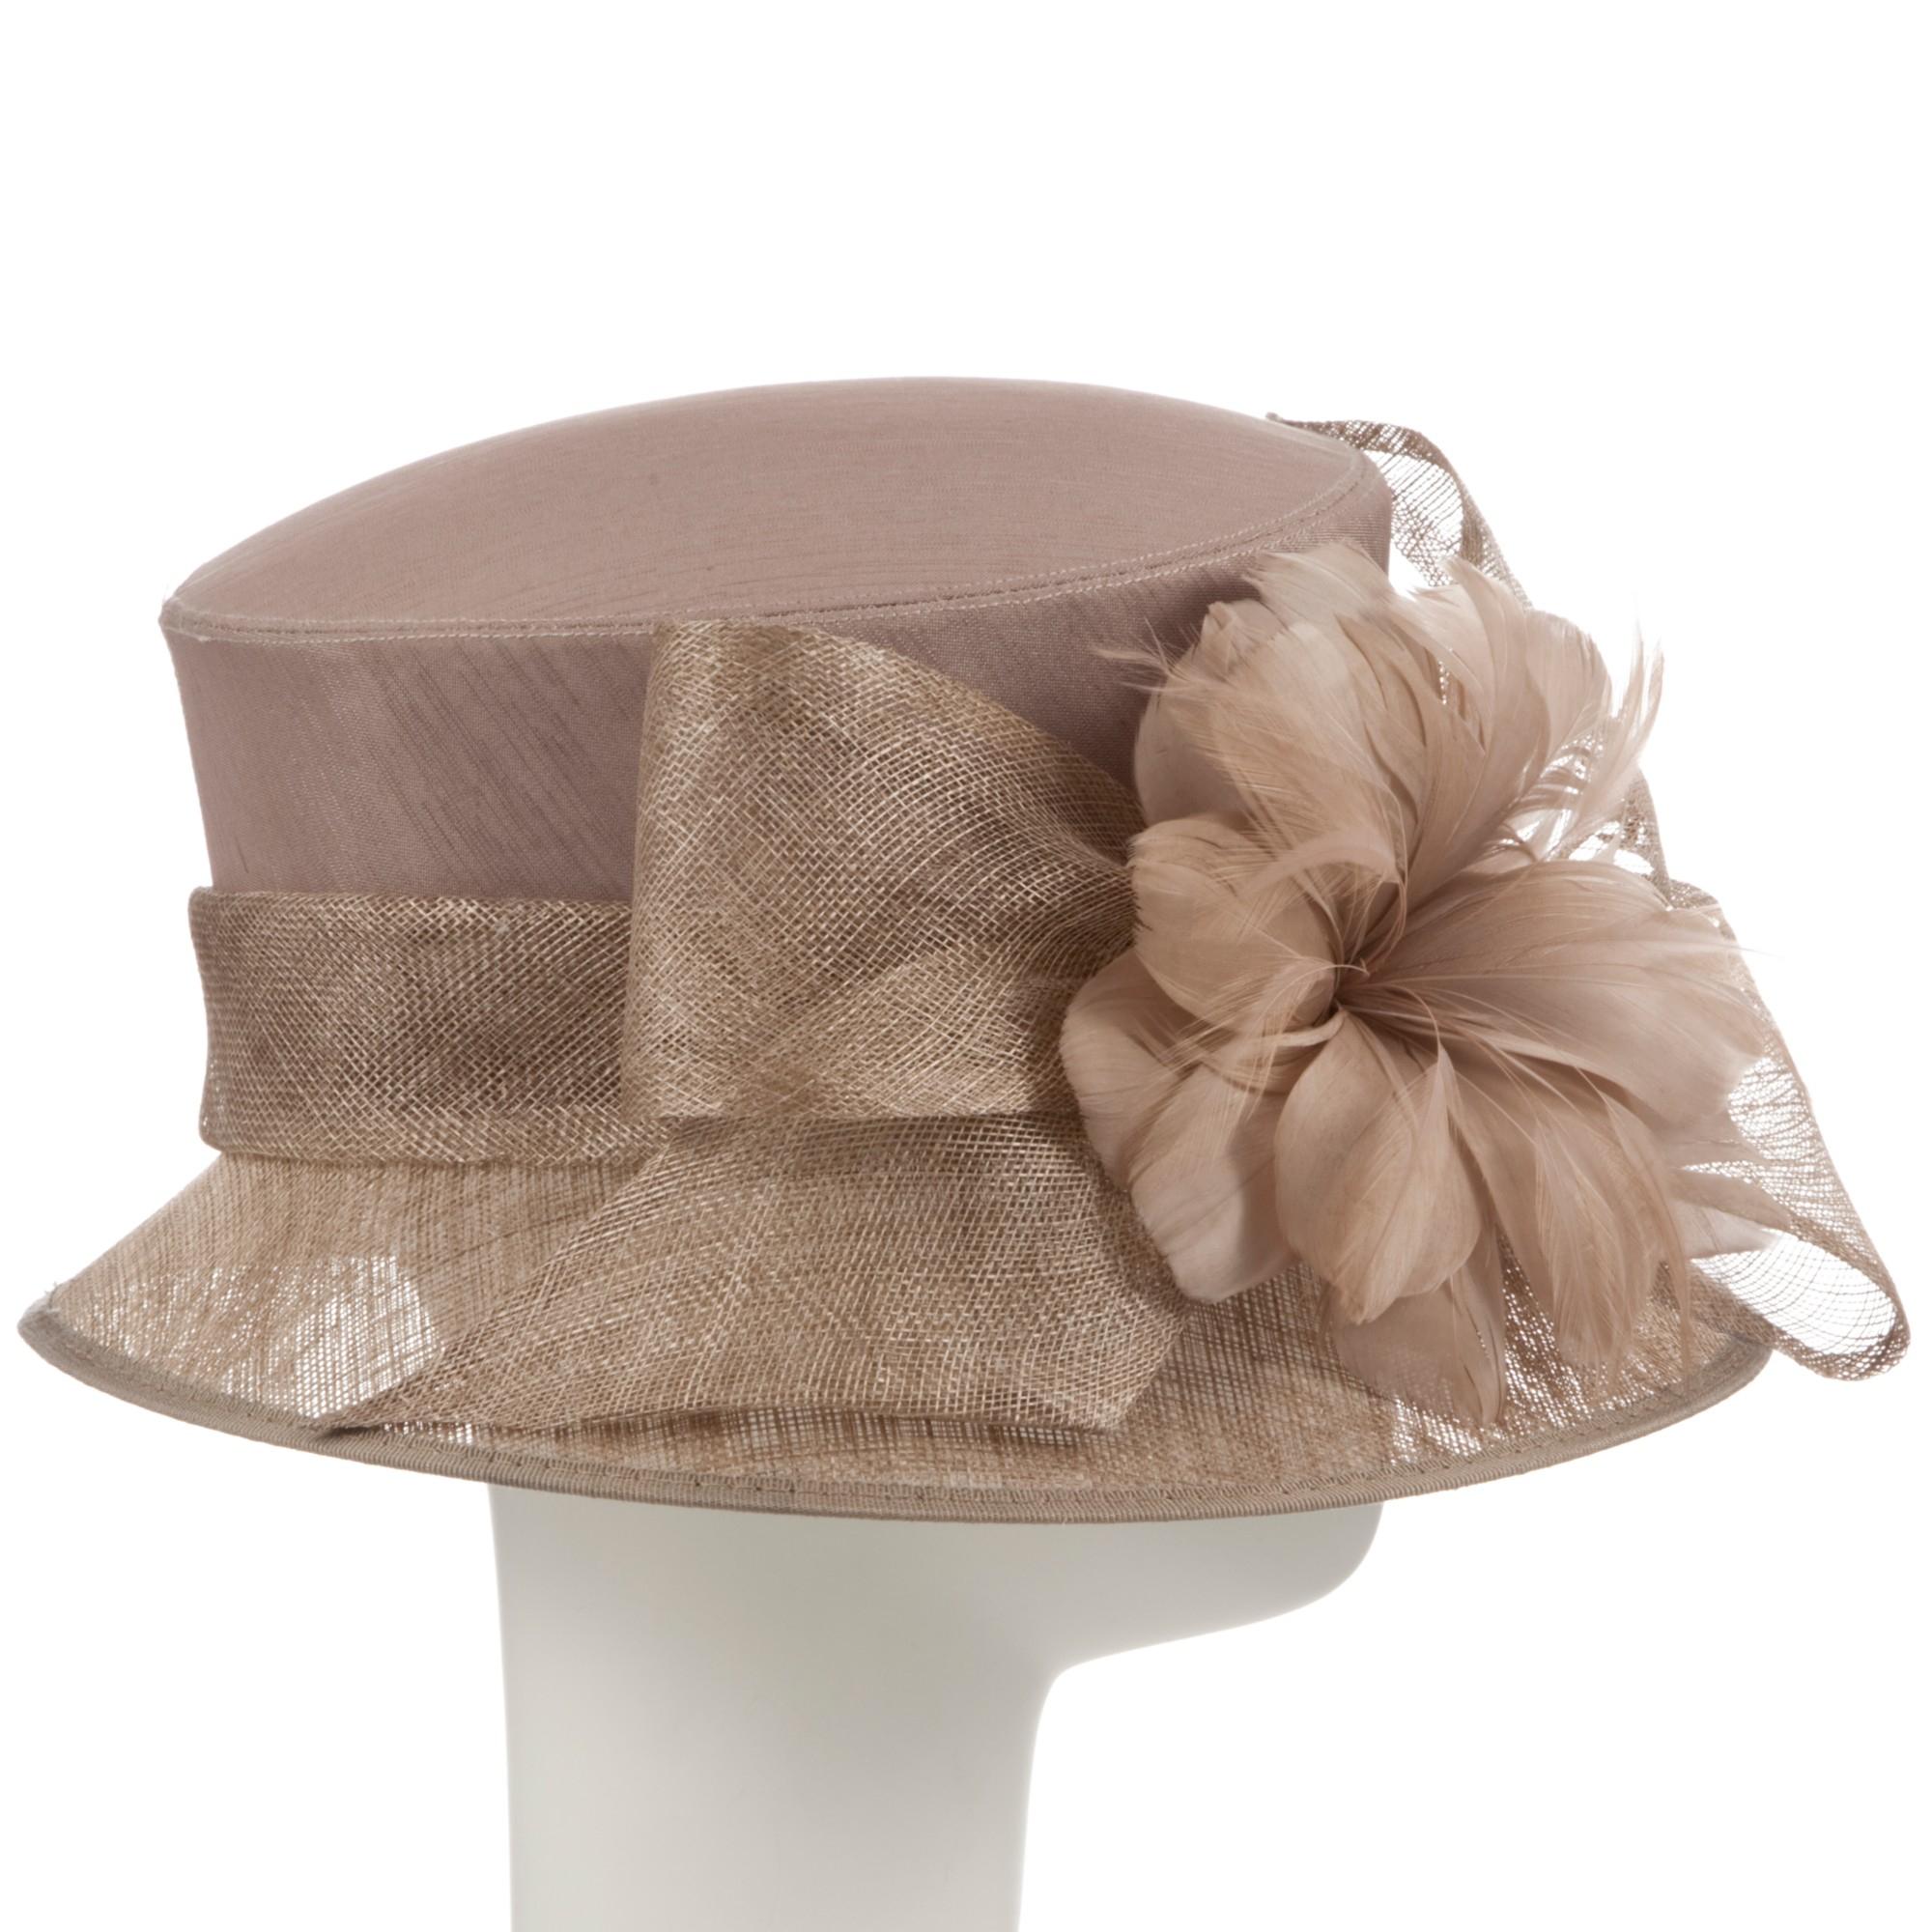 1ed9ab367f6f0 John Lewis Lottie Small Down Brim Occasion Hat in Brown - Lyst